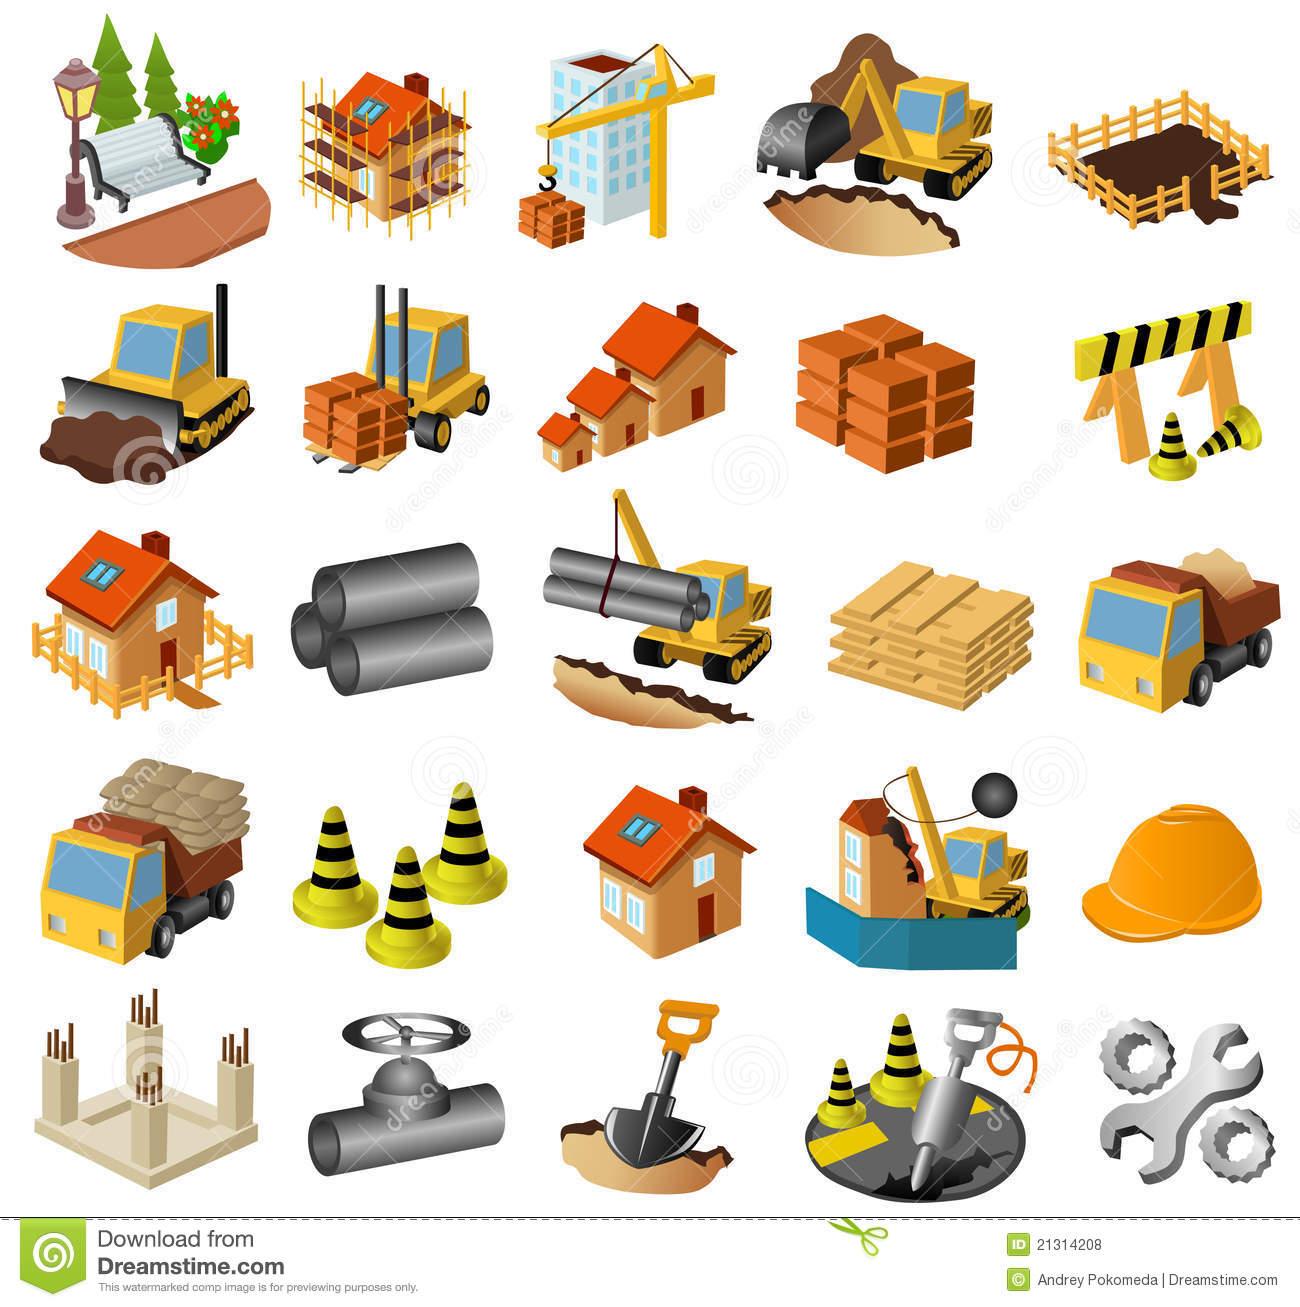 Building clipart construction. Free